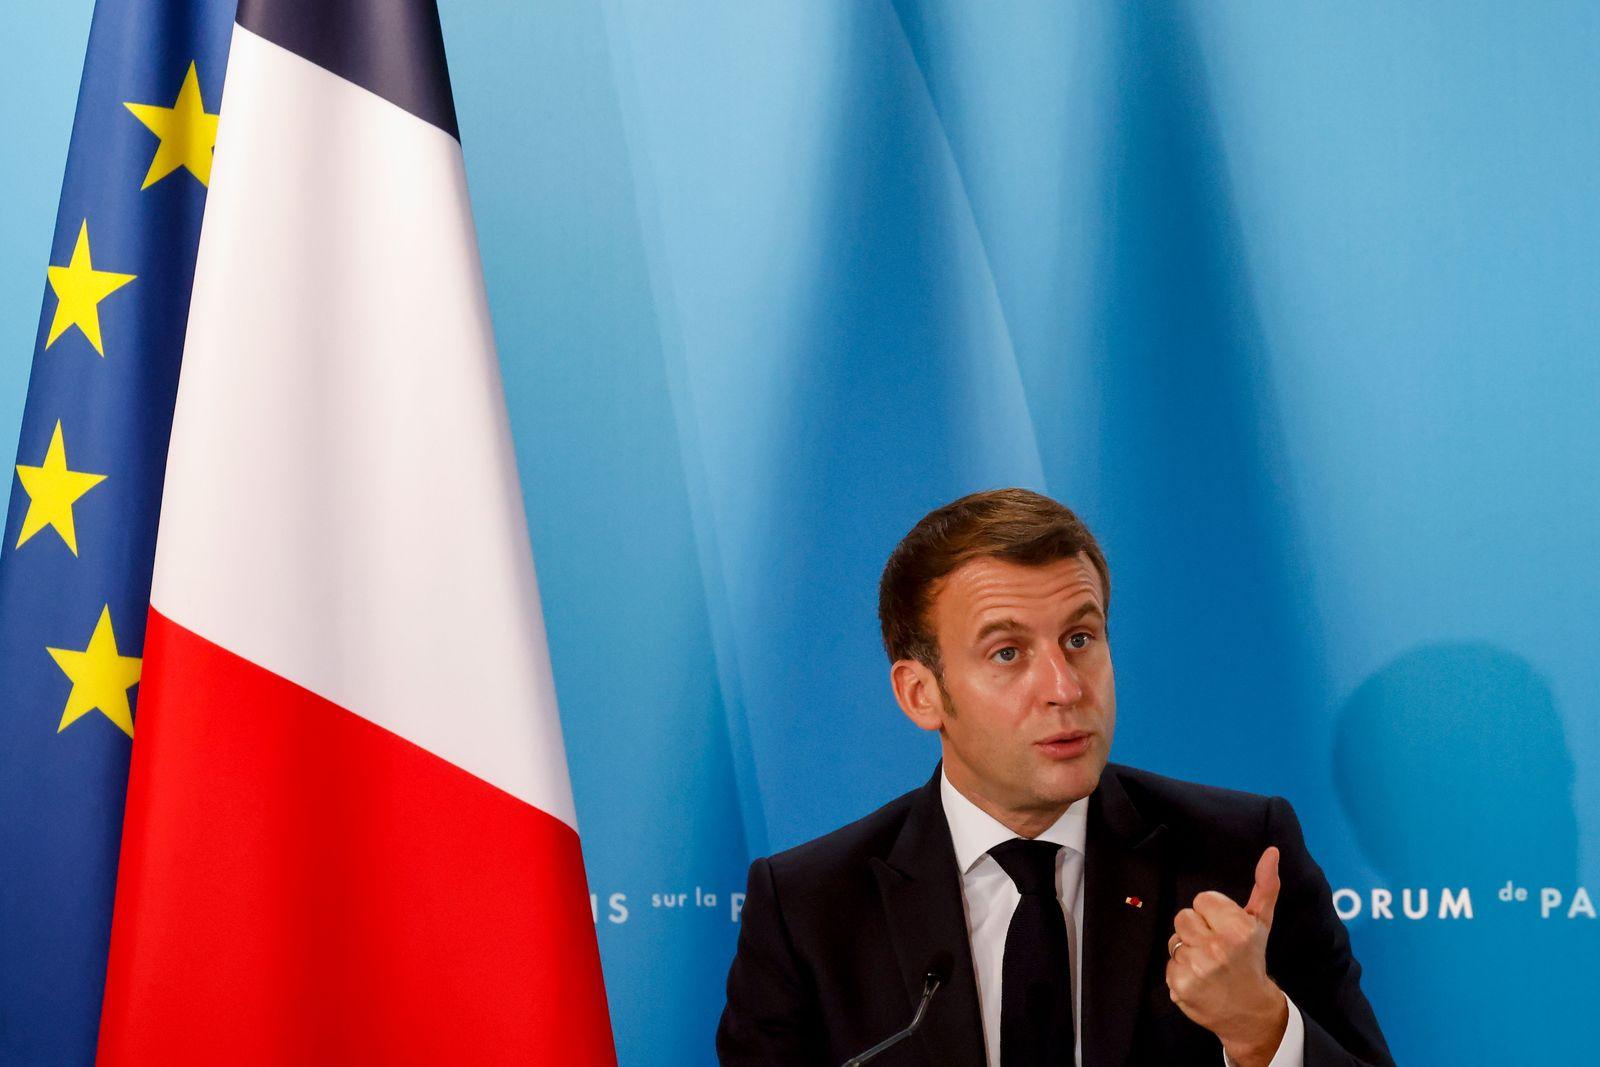 Peace Forum meeting at Elysee Palace, Paris, France - 12 Nov 2020